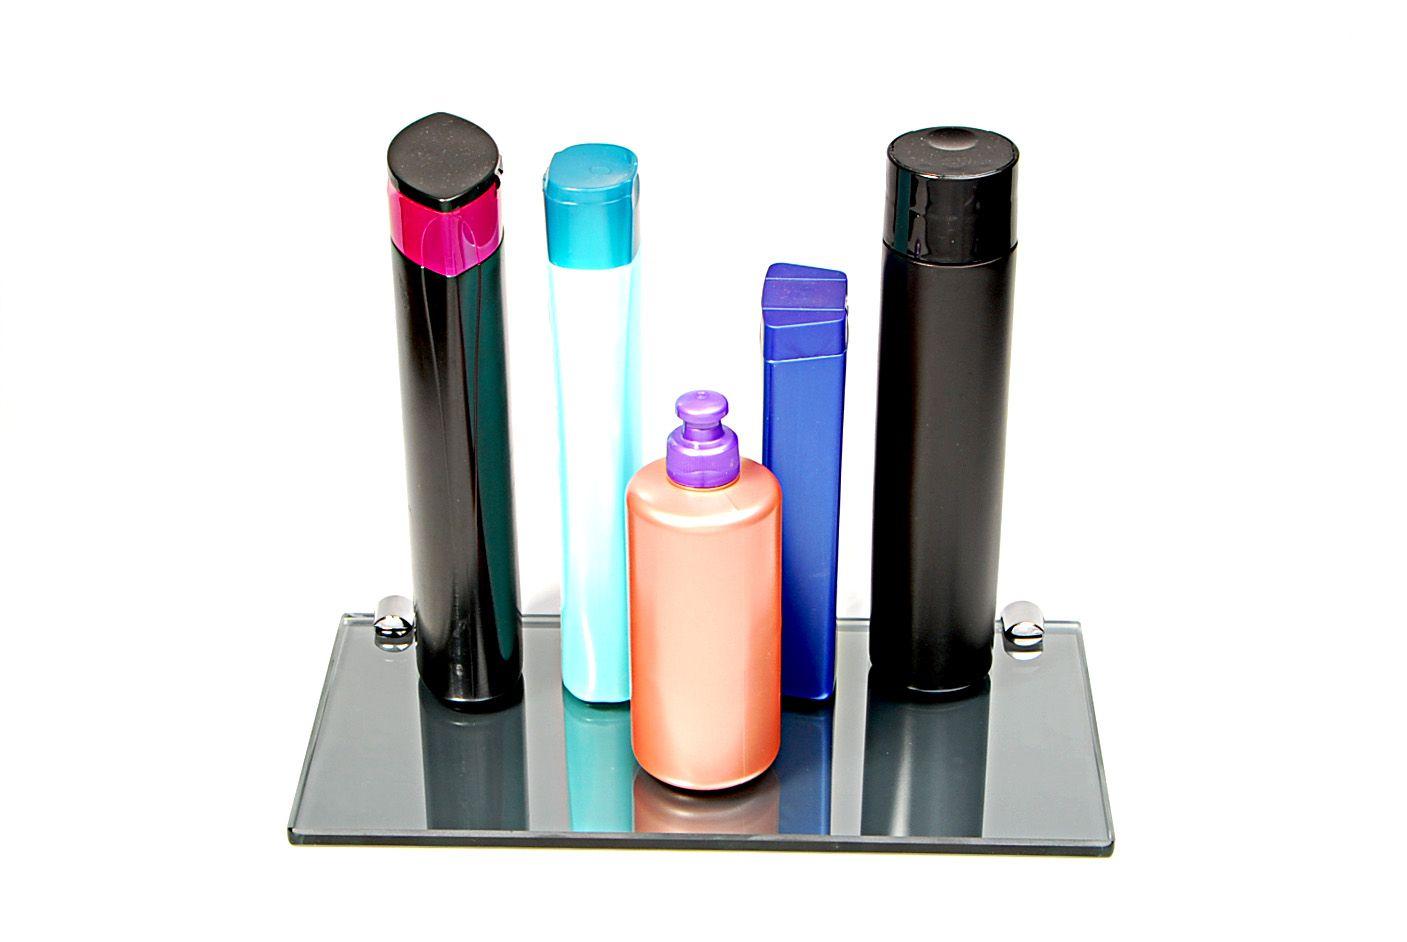 Porta Shampoo Reto em Vidro Refletivo Lapidado - Aquabox  - 30cmx14cmx8mm